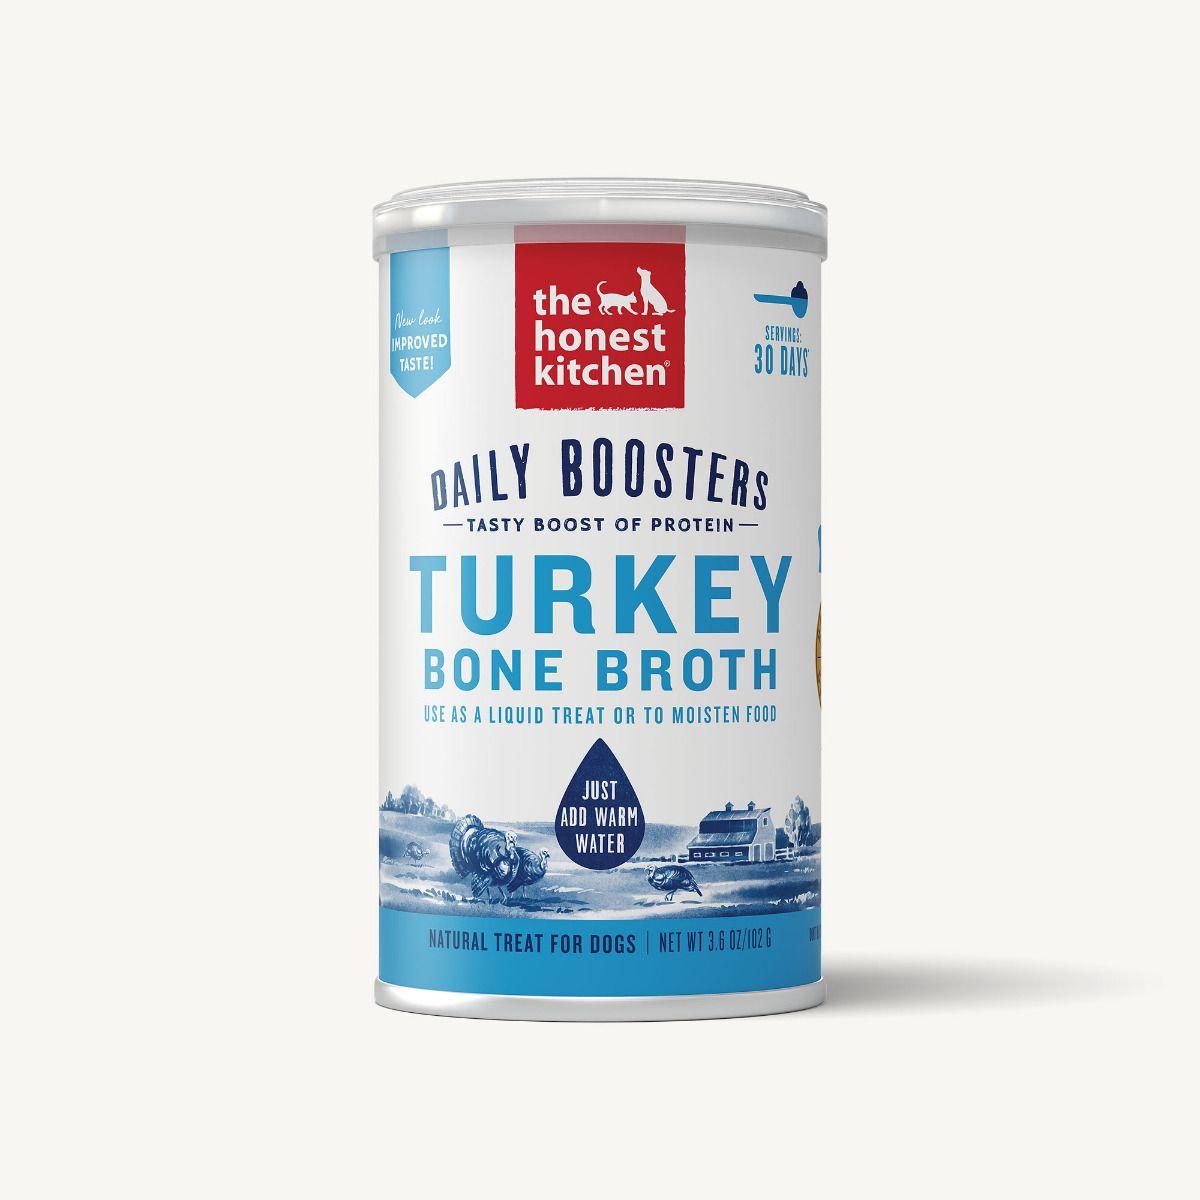 The Honest Kitchen Instant Bone Broth Turkey & Turmeric